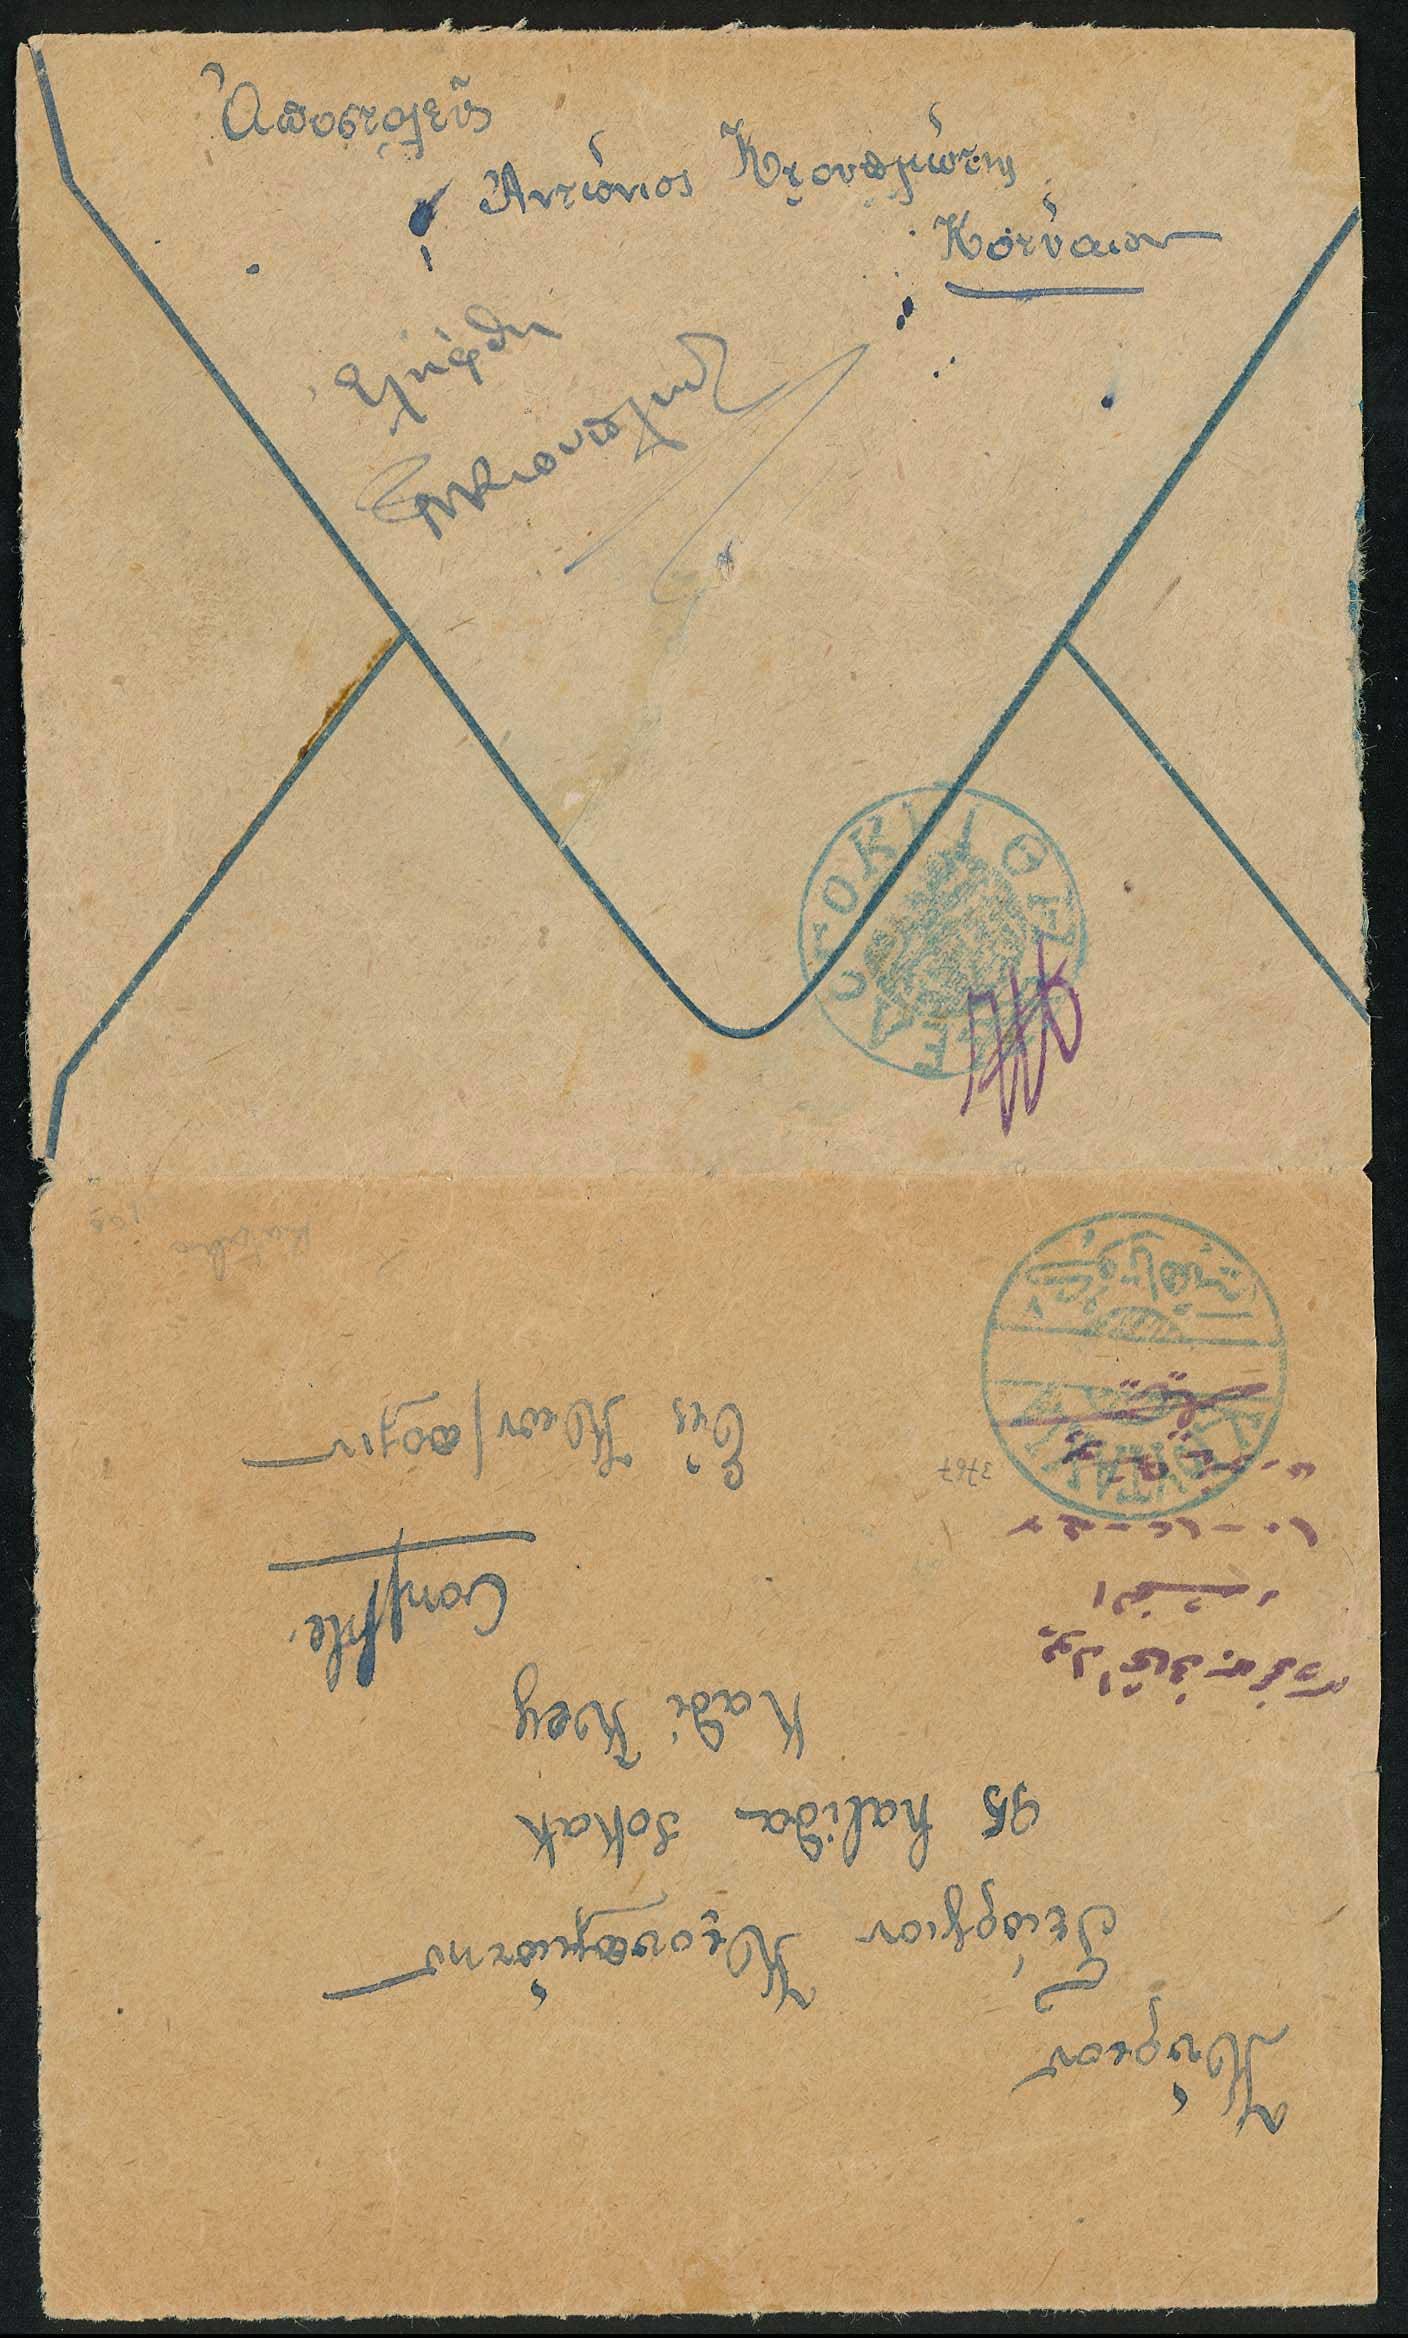 Lot 797 - -  SMYRNE,CONS/PLE & ASIA MINOR (before 1922) SMYRNE,CONS/PLE & ASIA MINOR (before 1922) -  A. Karamitsos Postal & Live Internet Auction 681 General Philatelic Auction